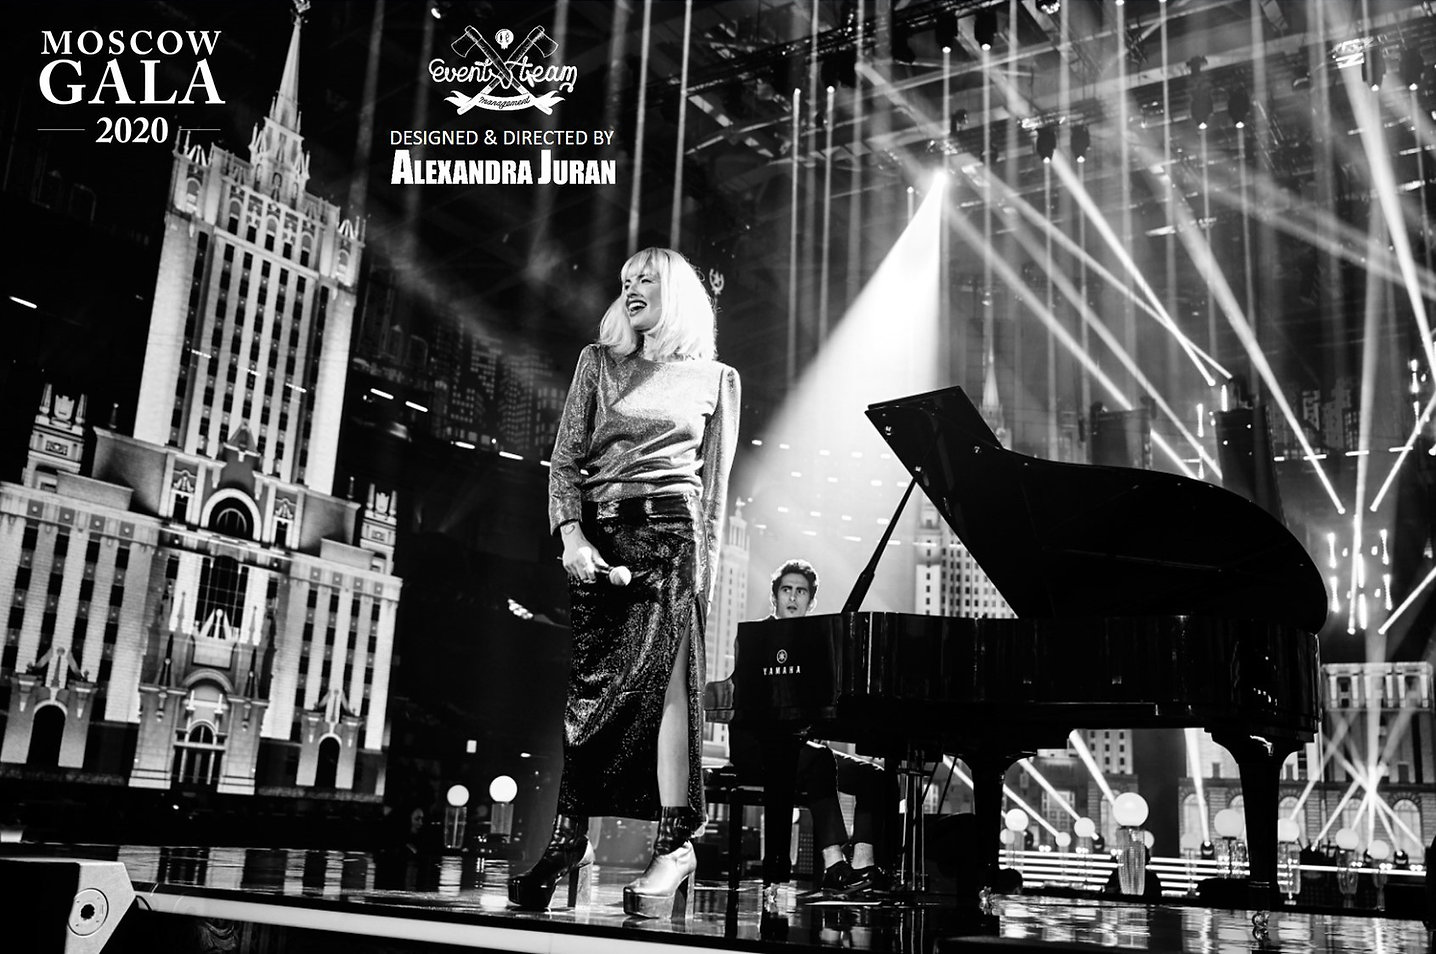 ALEXANDRA JURAN ETM MOSCOW GALA 7.jpg